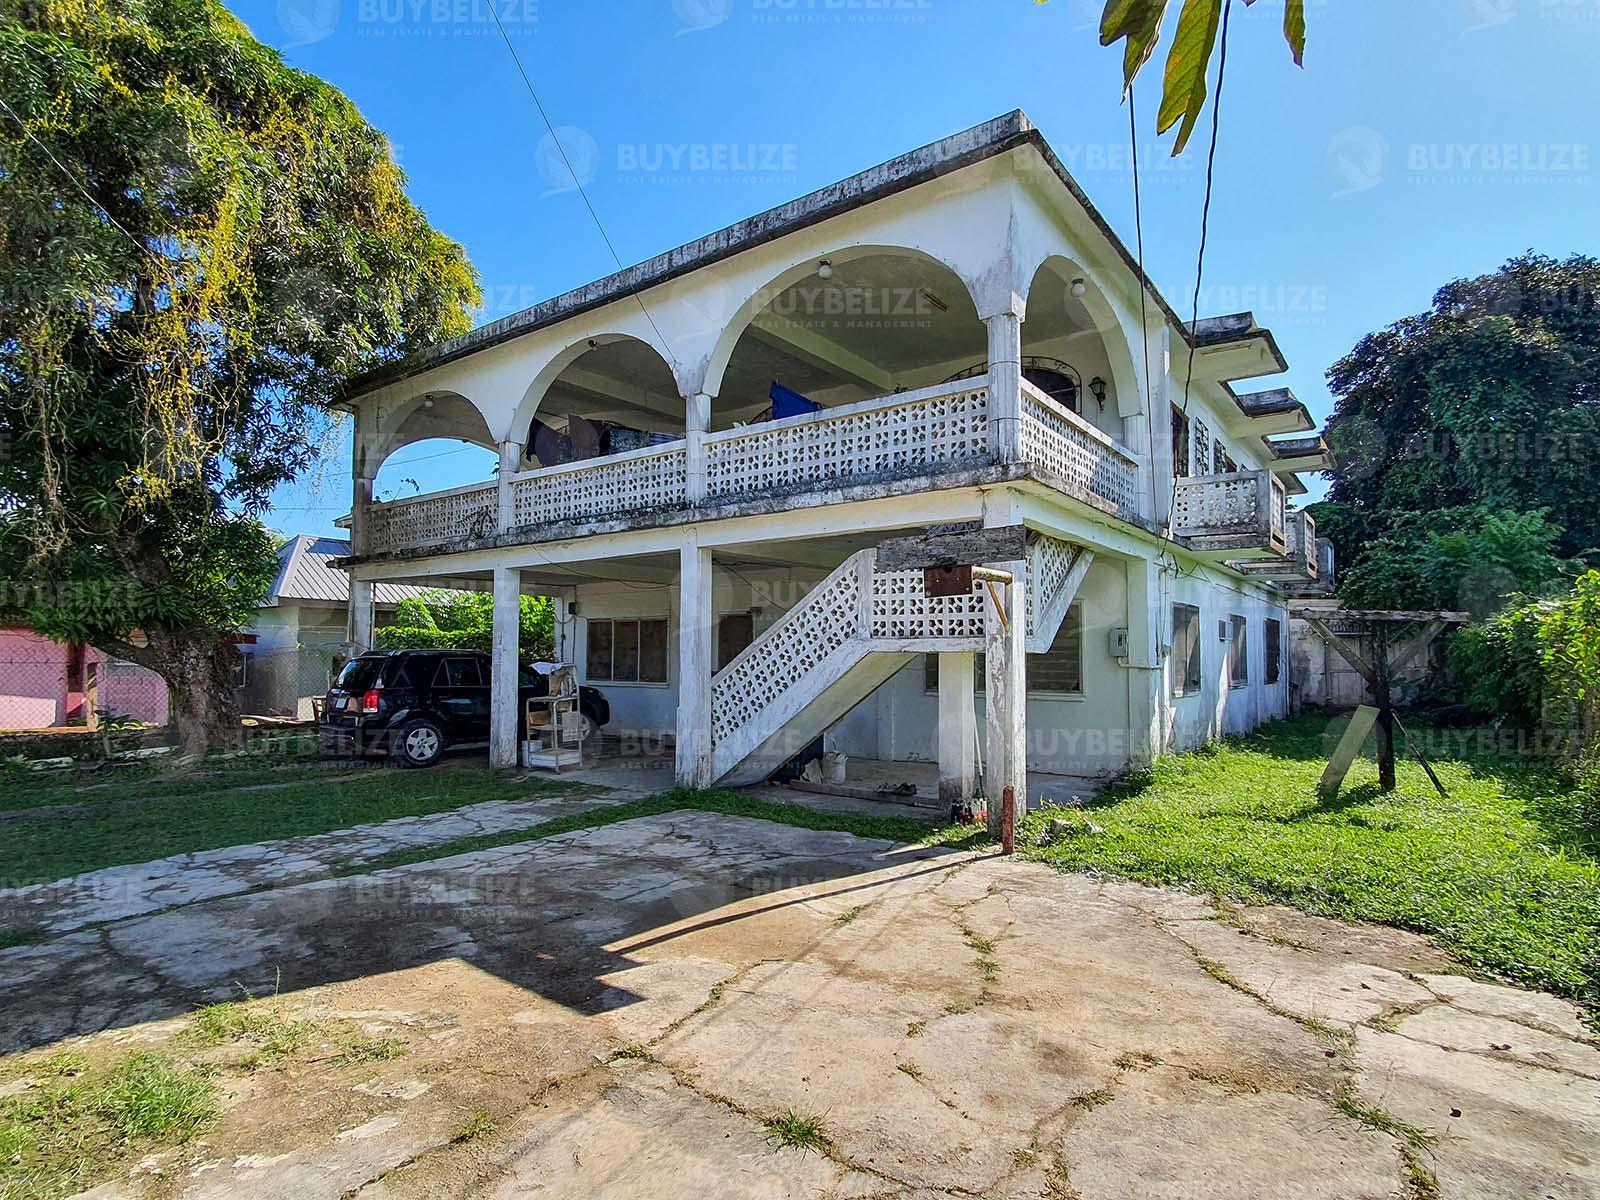 Building for Sale in Punta Gorda Town, Belize